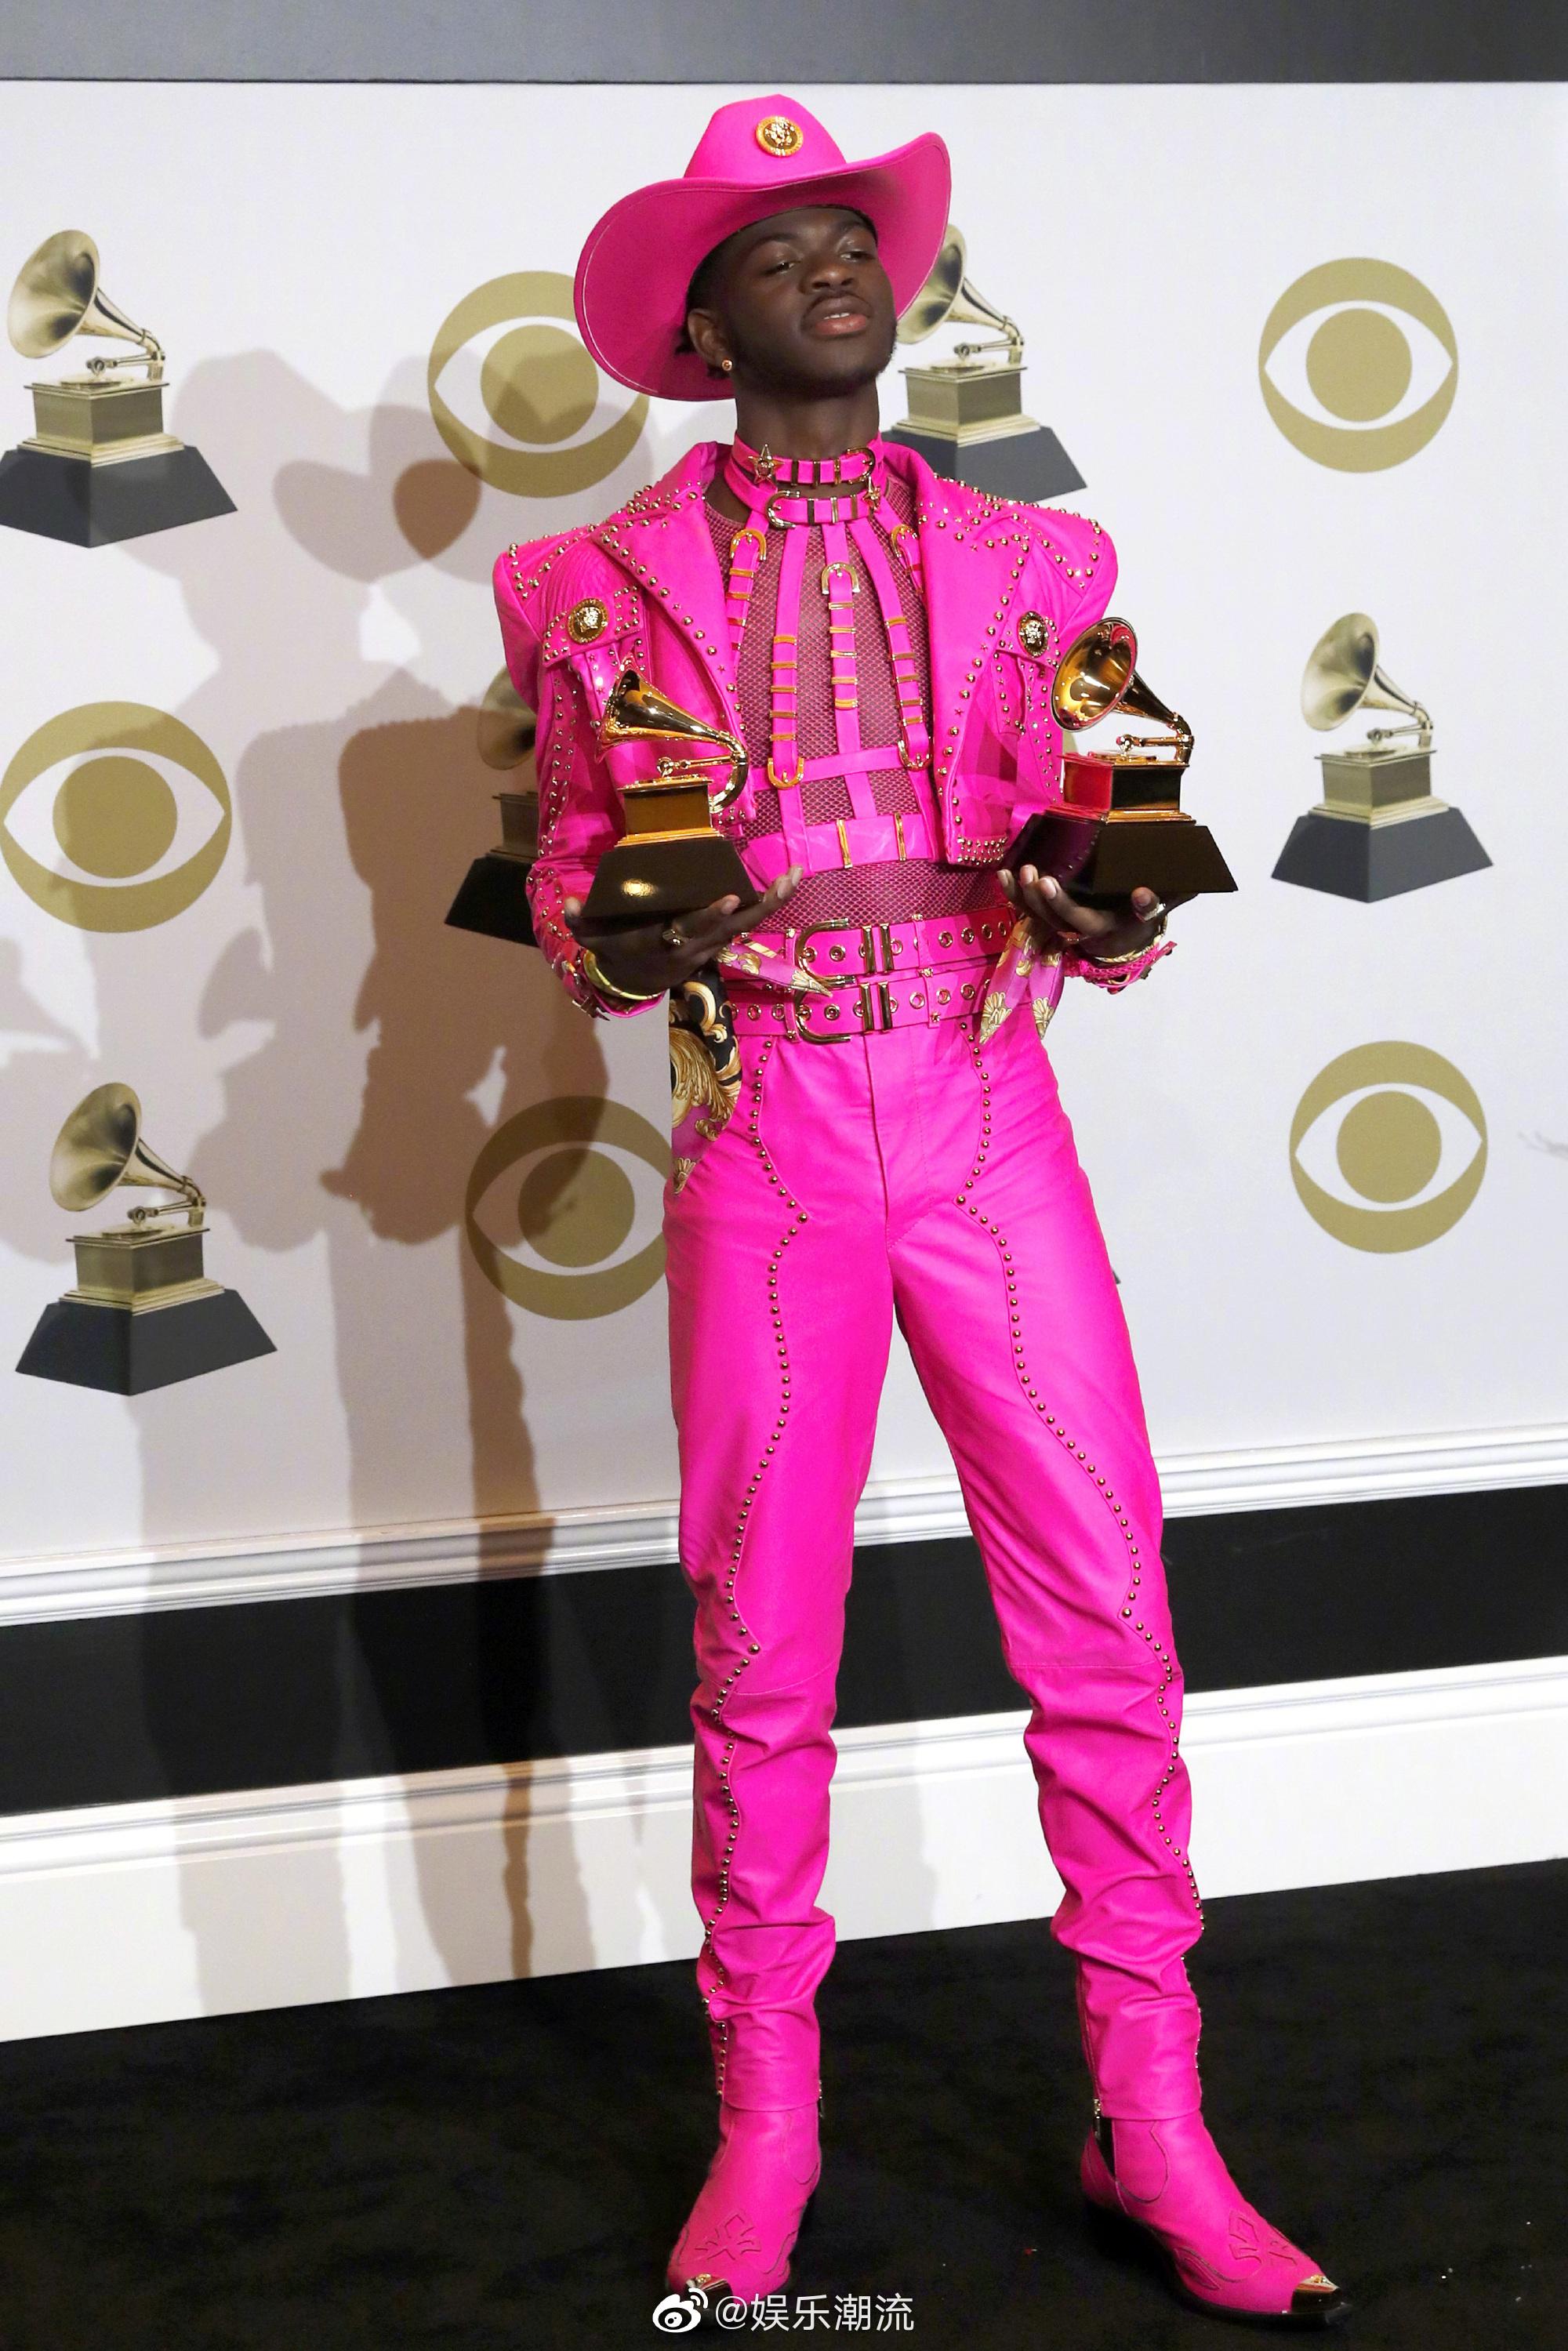 Lil Nas X 的格莱美look | 粉墨男孩登场,这个荧光粉真的快亮瞎我